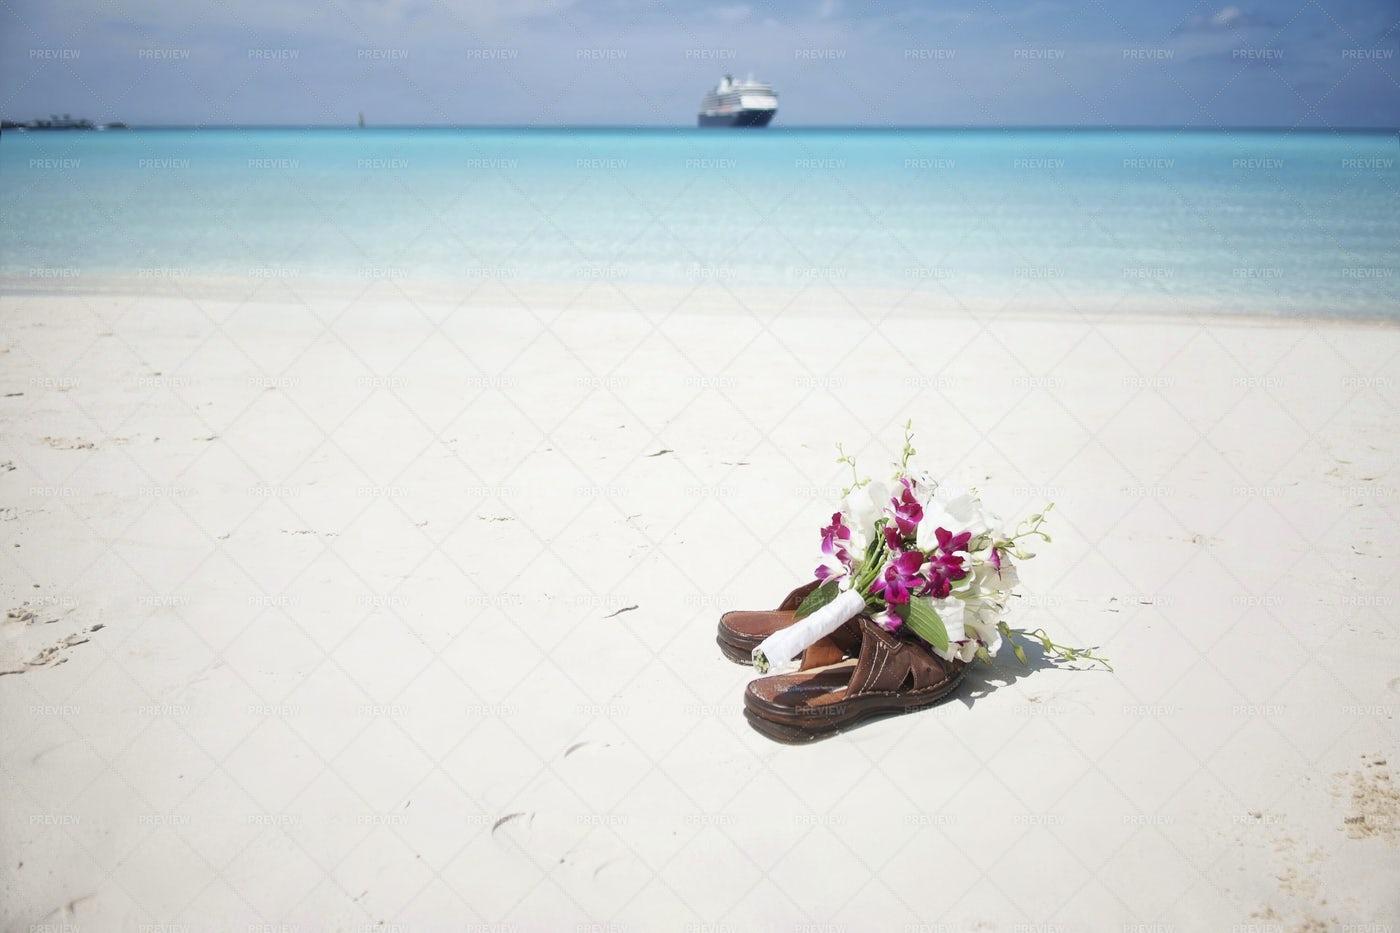 Bridal Bouquet On Flip Flops: Stock Photos